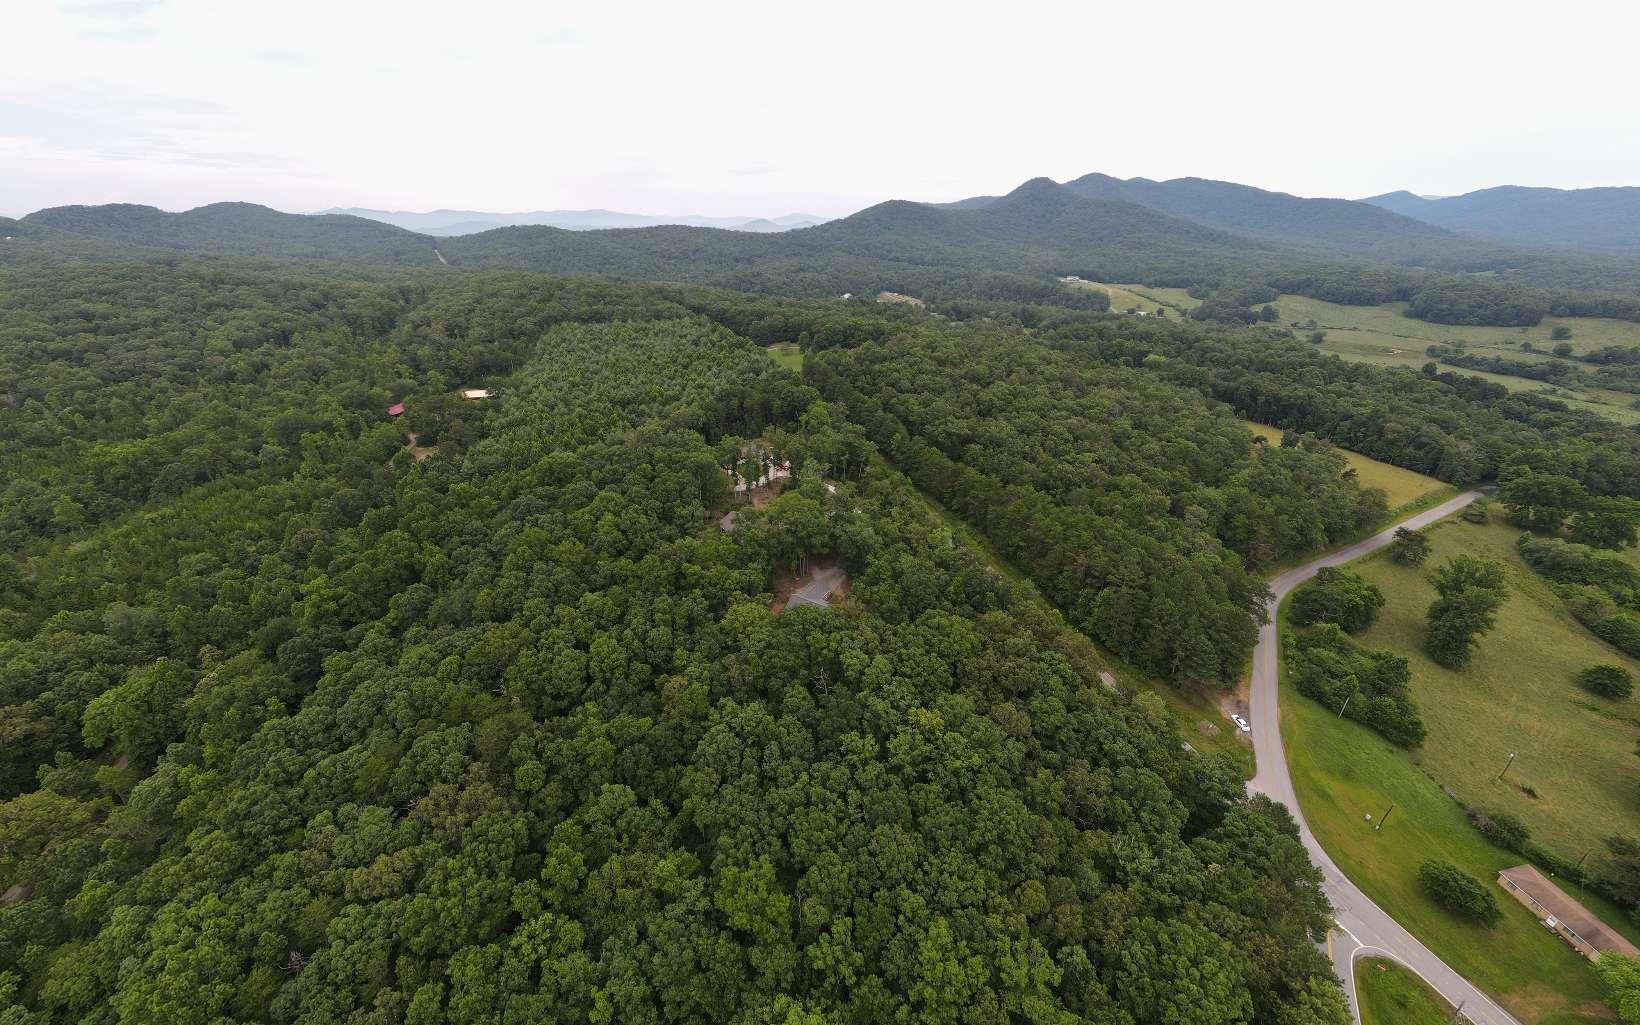 13.27 GUMLOG ROAD, Blairsville, Georgia 30512, ,Lots And Land,For Sale,13.27 GUMLOG ROAD,299012